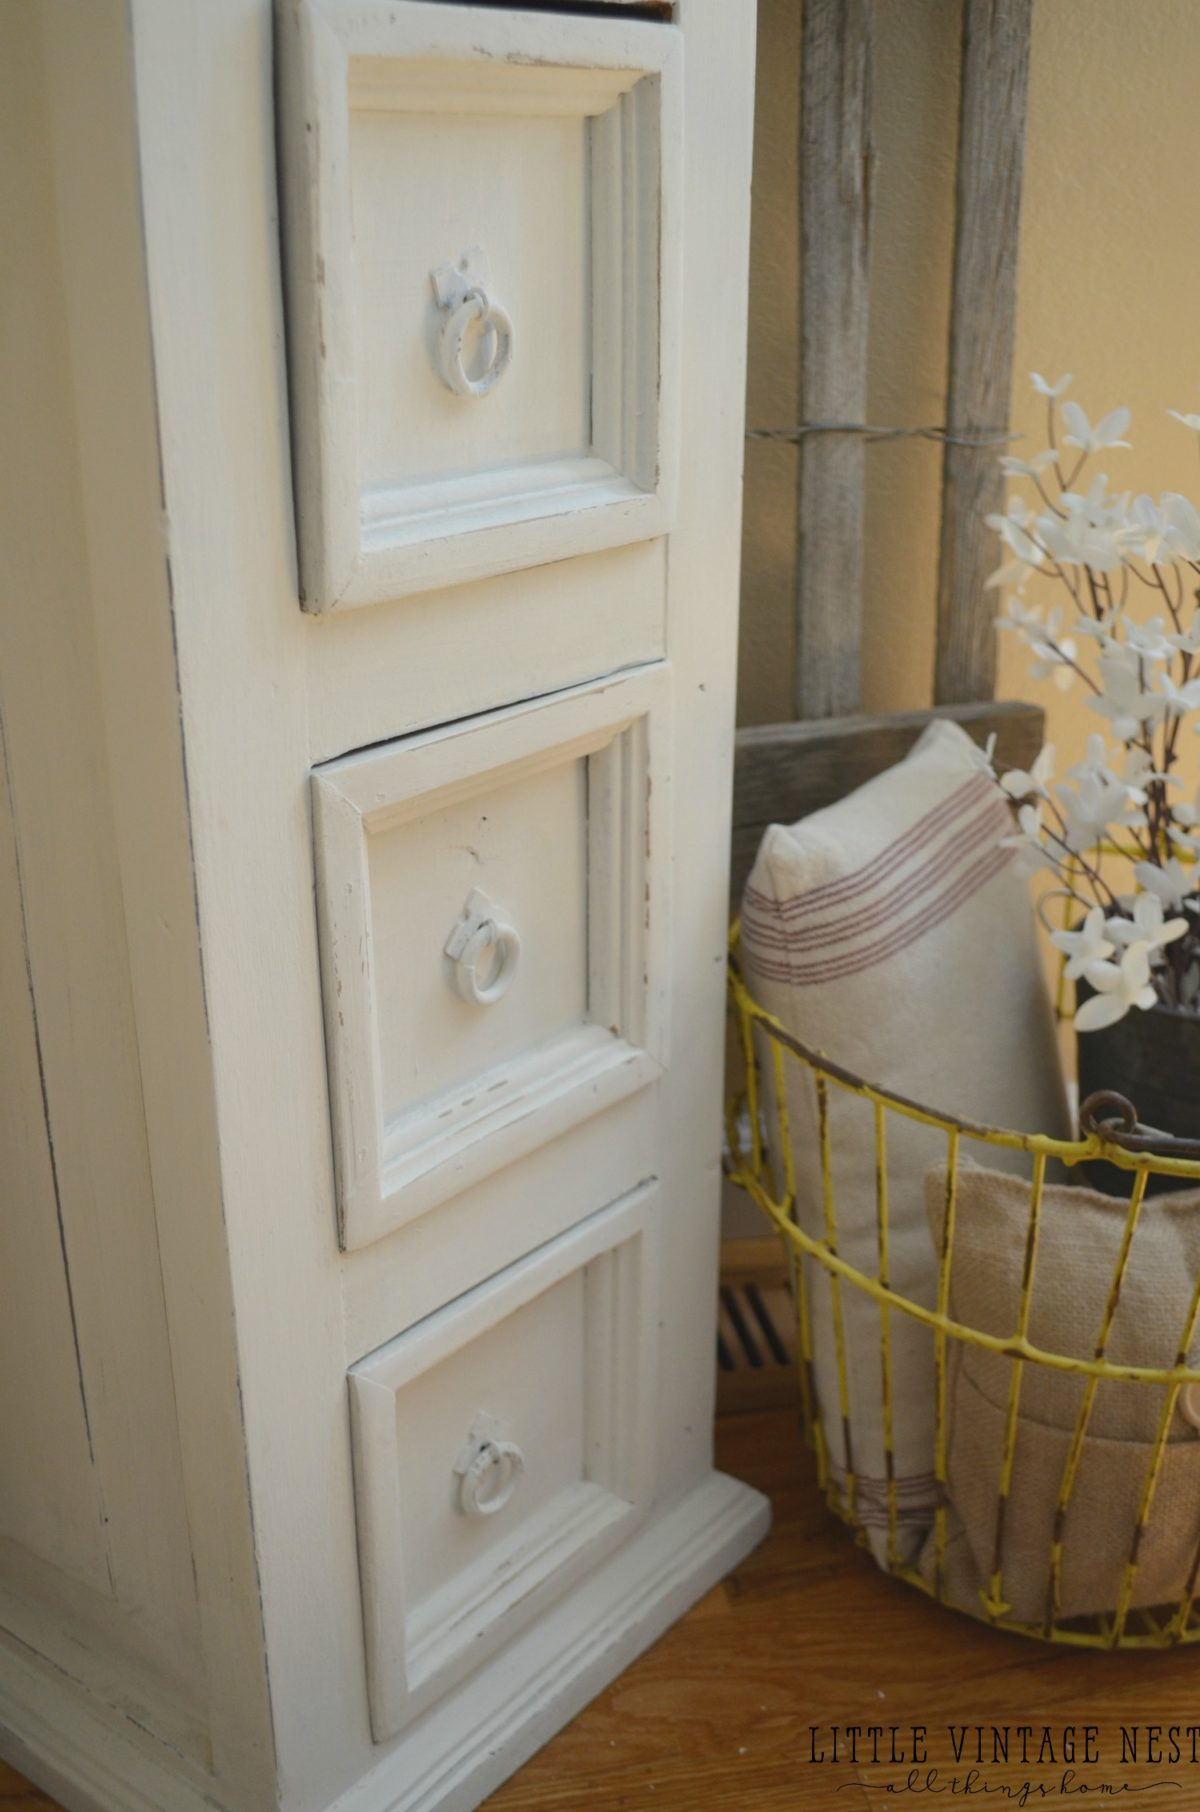 Farmhouse Decor & Painted Storage Cabinet